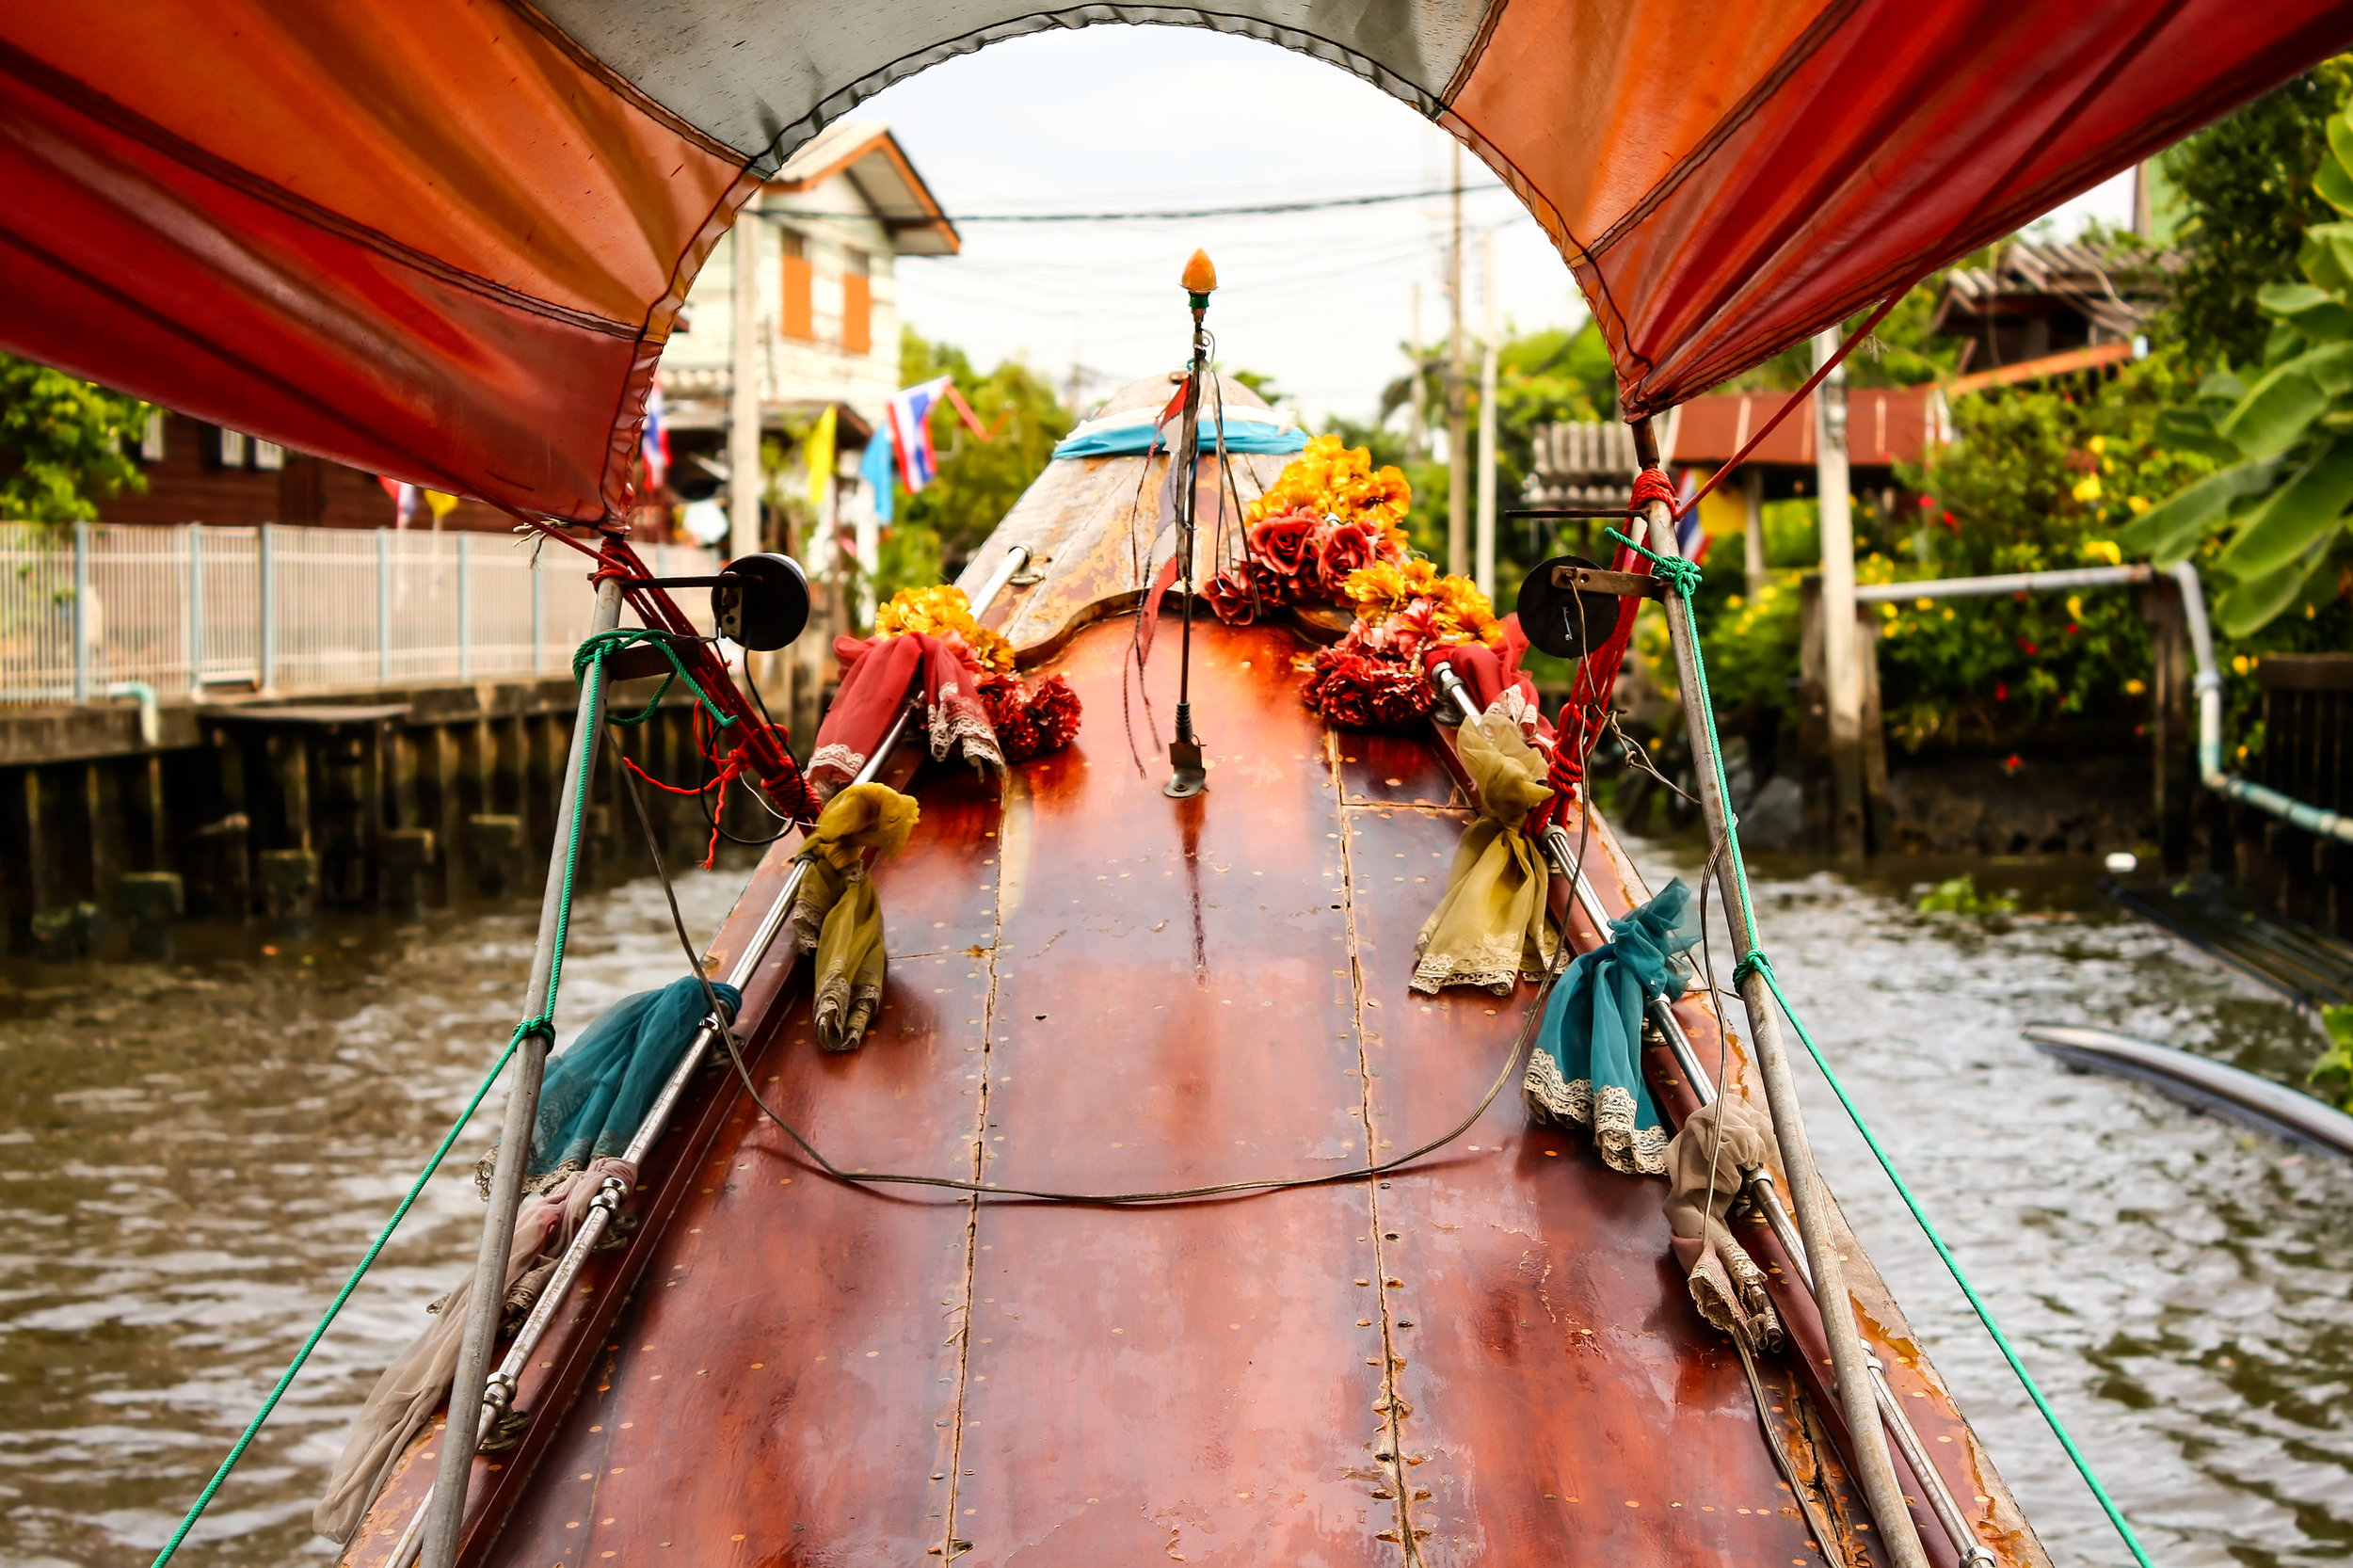 Boston Luxury Custom Honeymoon Travel Agent Advisor Planning Bangkok Floating Market Boat Long Tail.jpeg